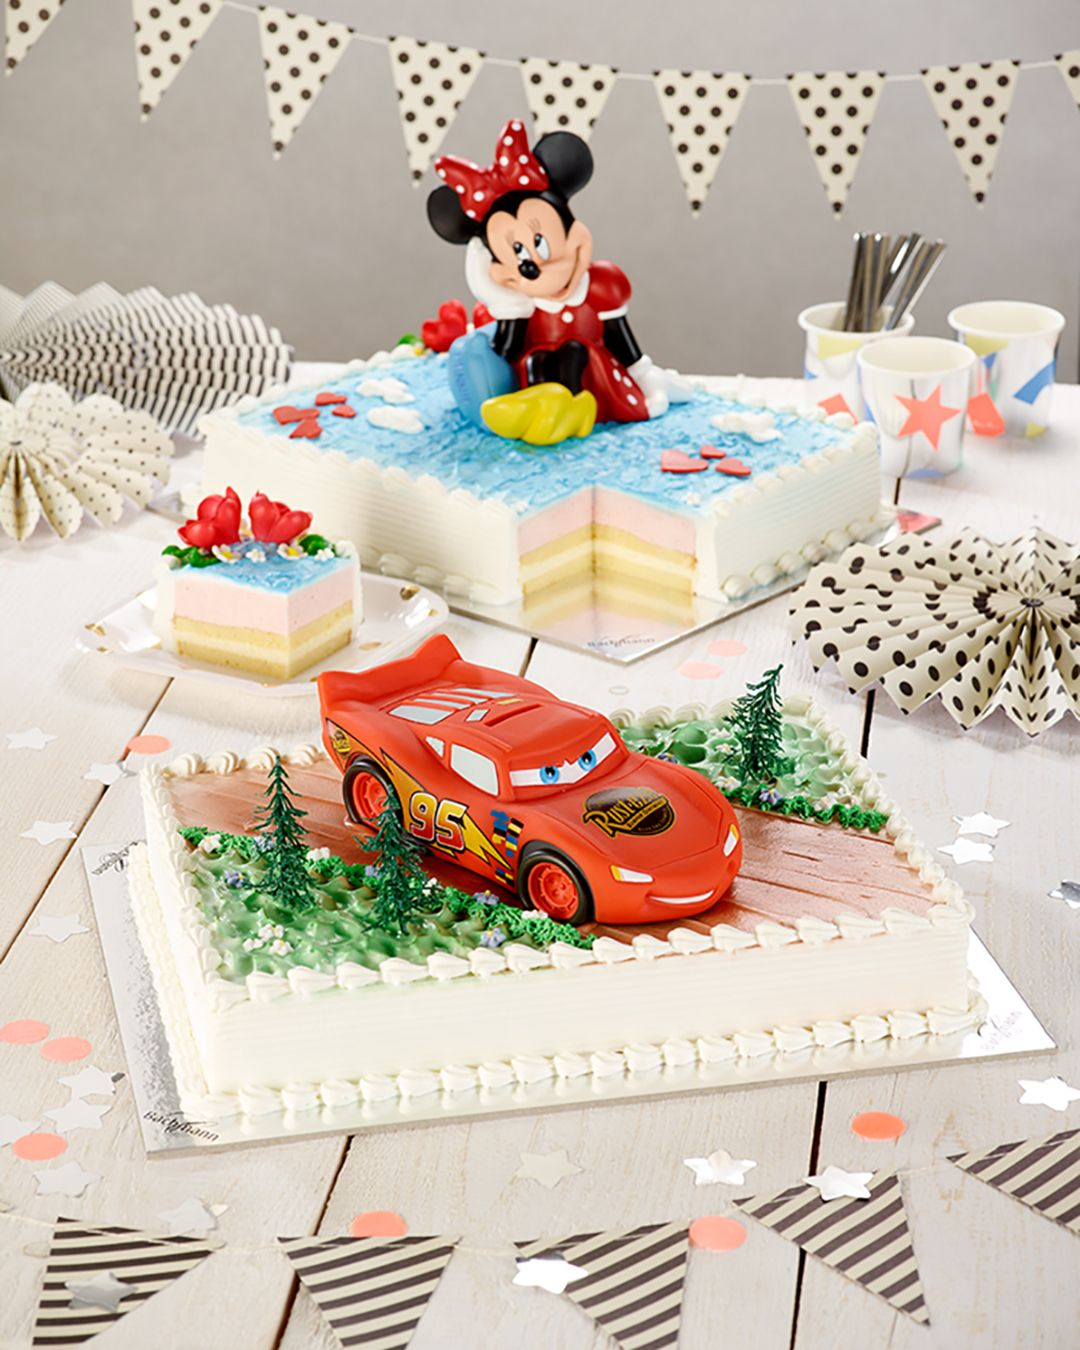 Torte Spielzeug